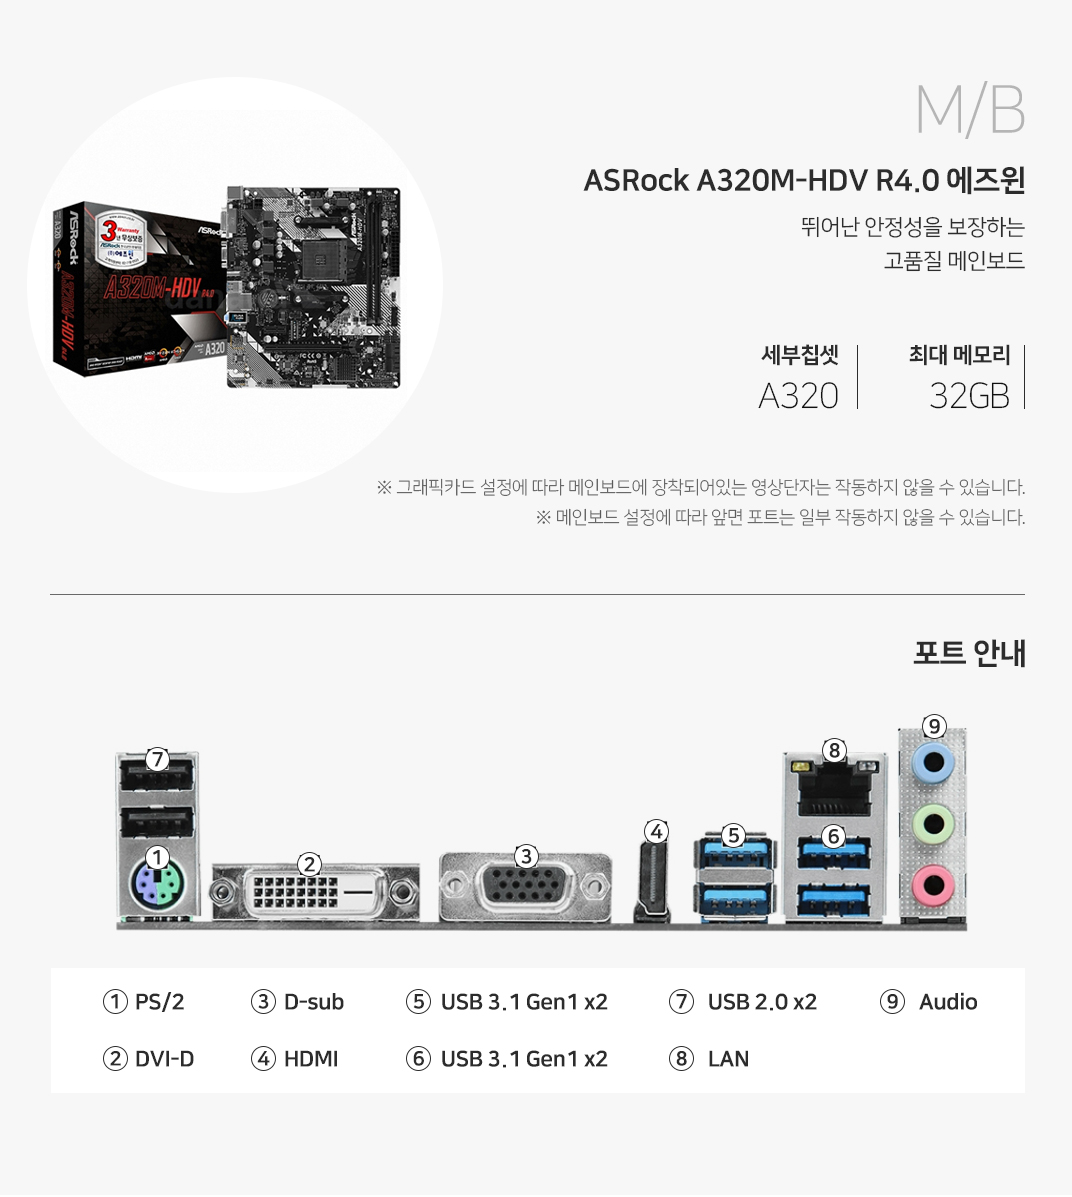 M/B ASRock A320M-HDV R4.0 에즈윈 뛰어난 안정성을 보장하는 고품질 메인보드 세부칩셋 A320 최대 메모리 32GB 그래픽 설정에 따라 메인보드에 장착되어 있는 영상단자는 작동하지 않을 수 있습니다. 메인보드 설정에 따라 앞면 포트는 일부 작동하지 않을 수 있습니다.